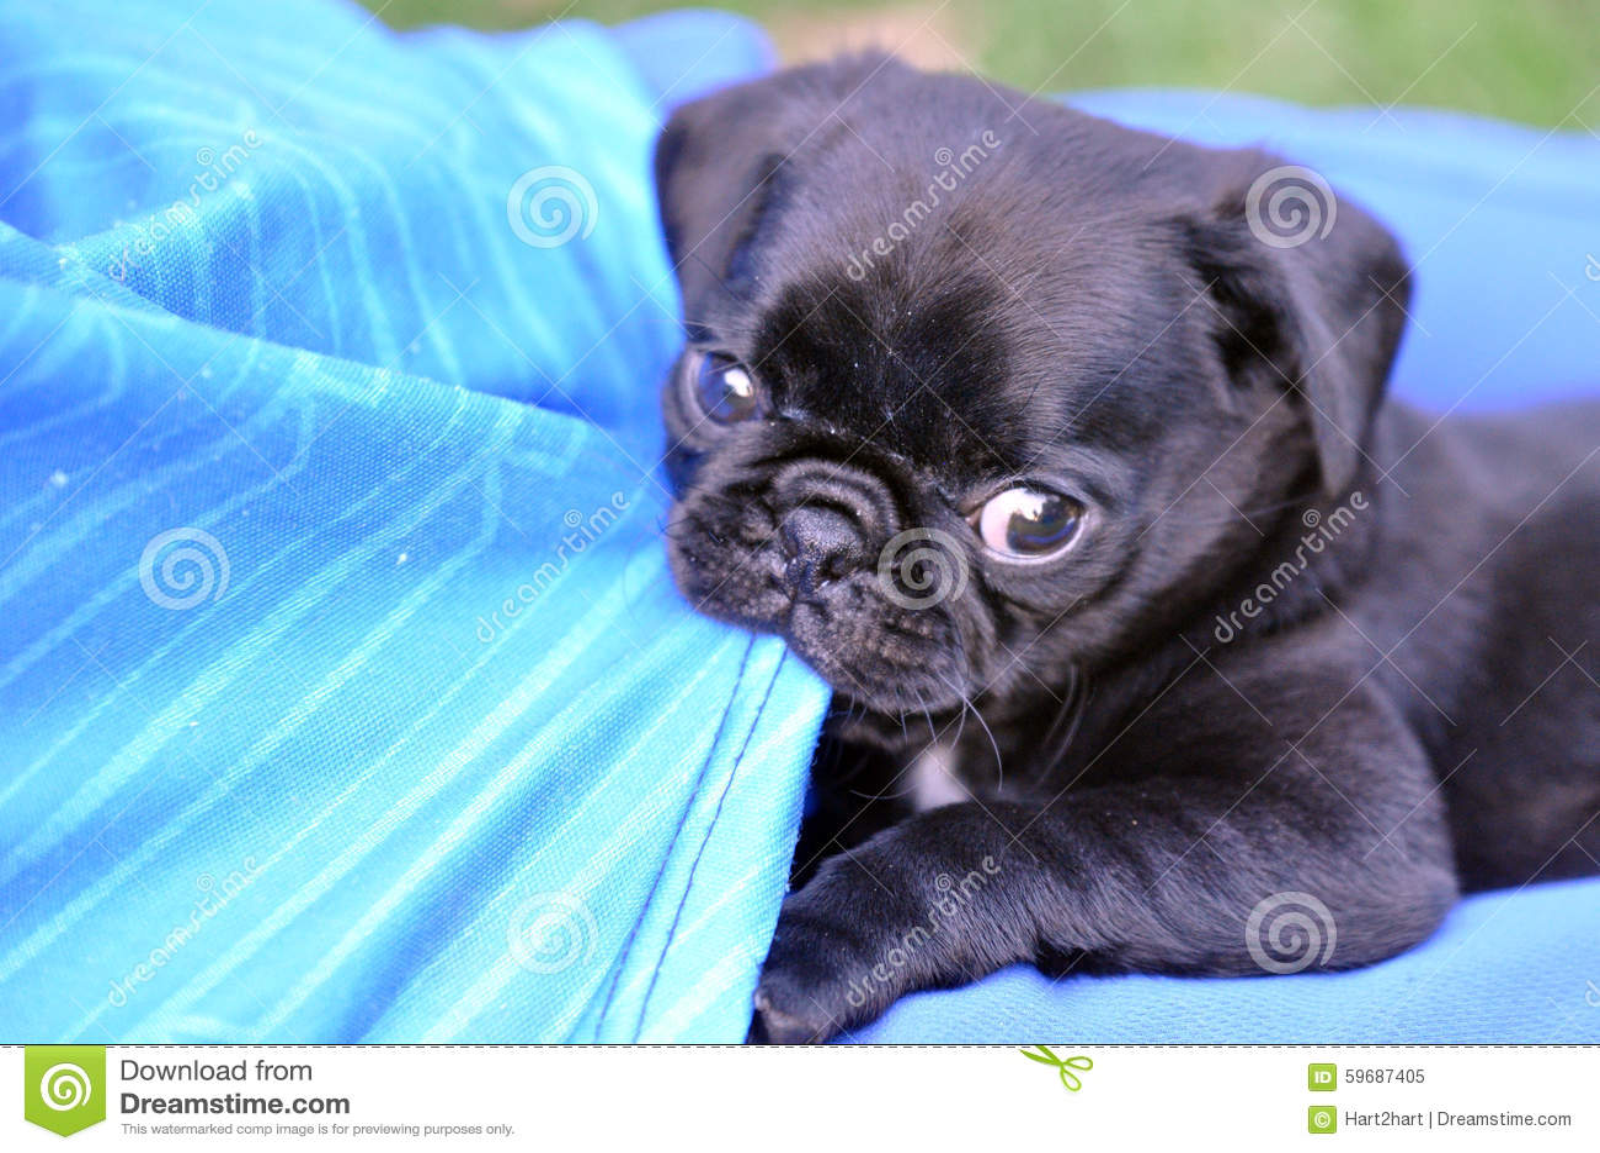 Naughty Puppy Stock Image Image Of Biting Chew Innocent 59687405